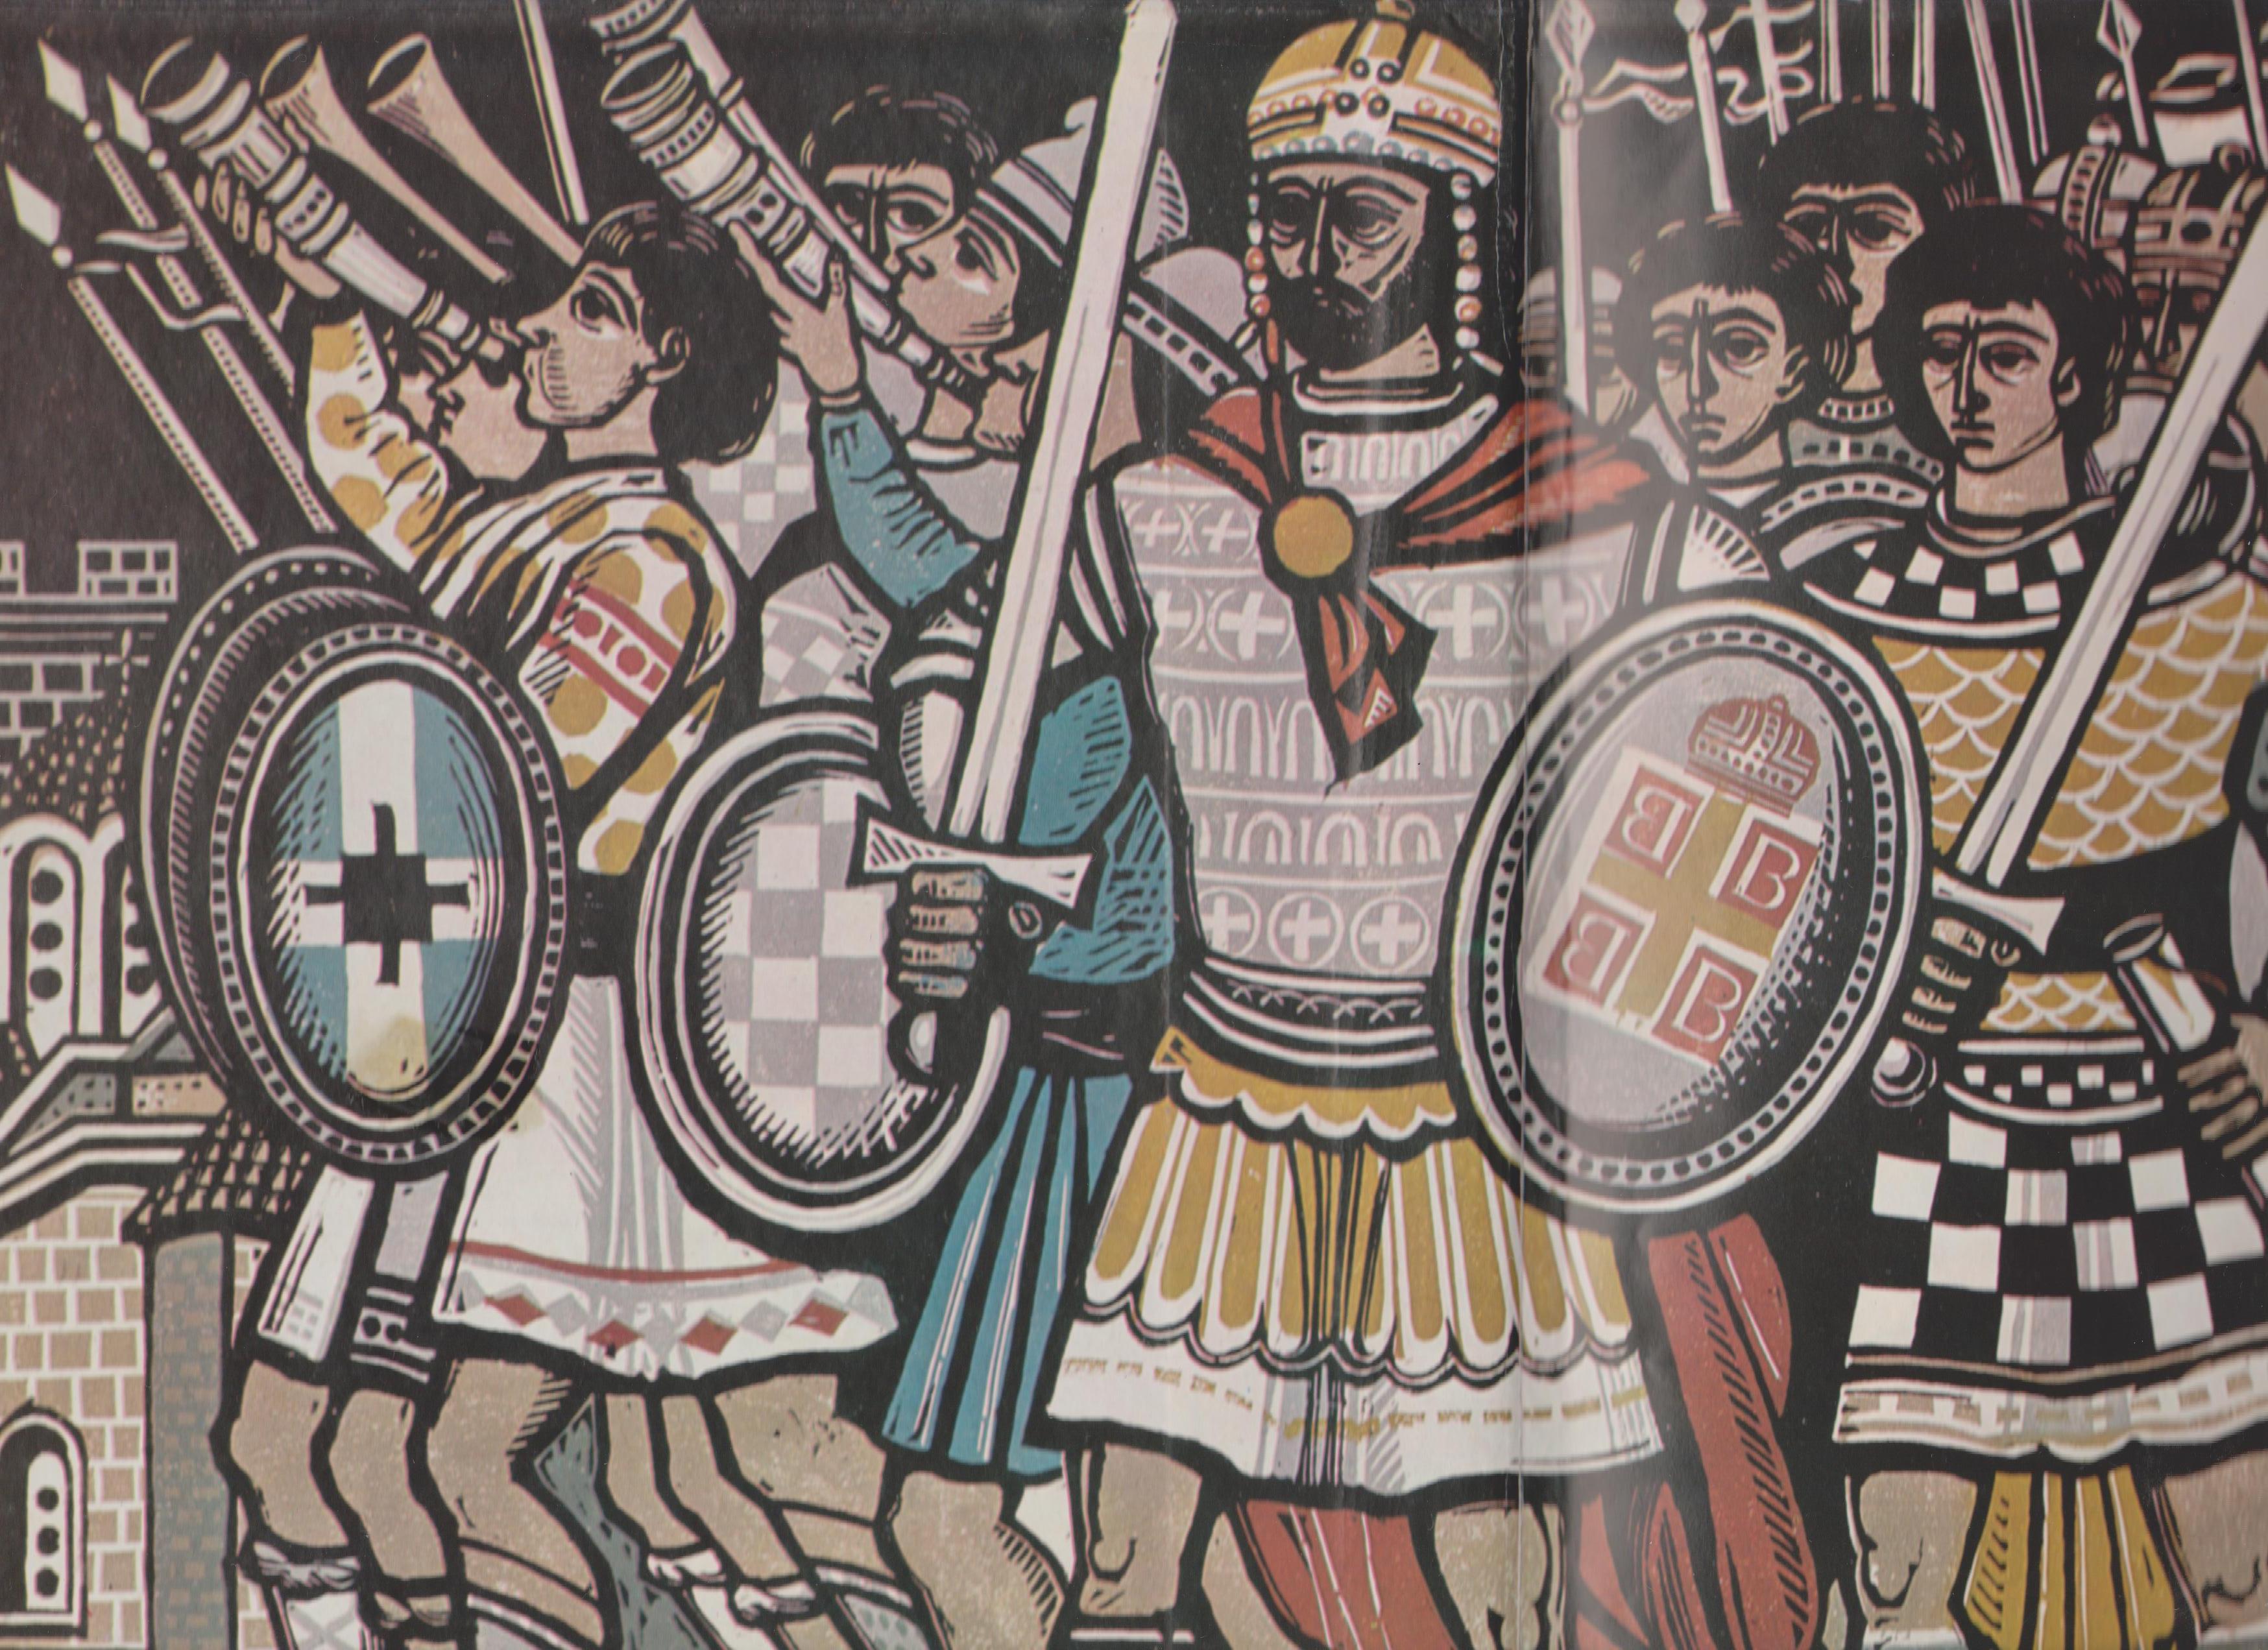 http://upload.wikimedia.org/wikipedia/commons/f/fb/Constantine_Palaiologos_1453.jpeg